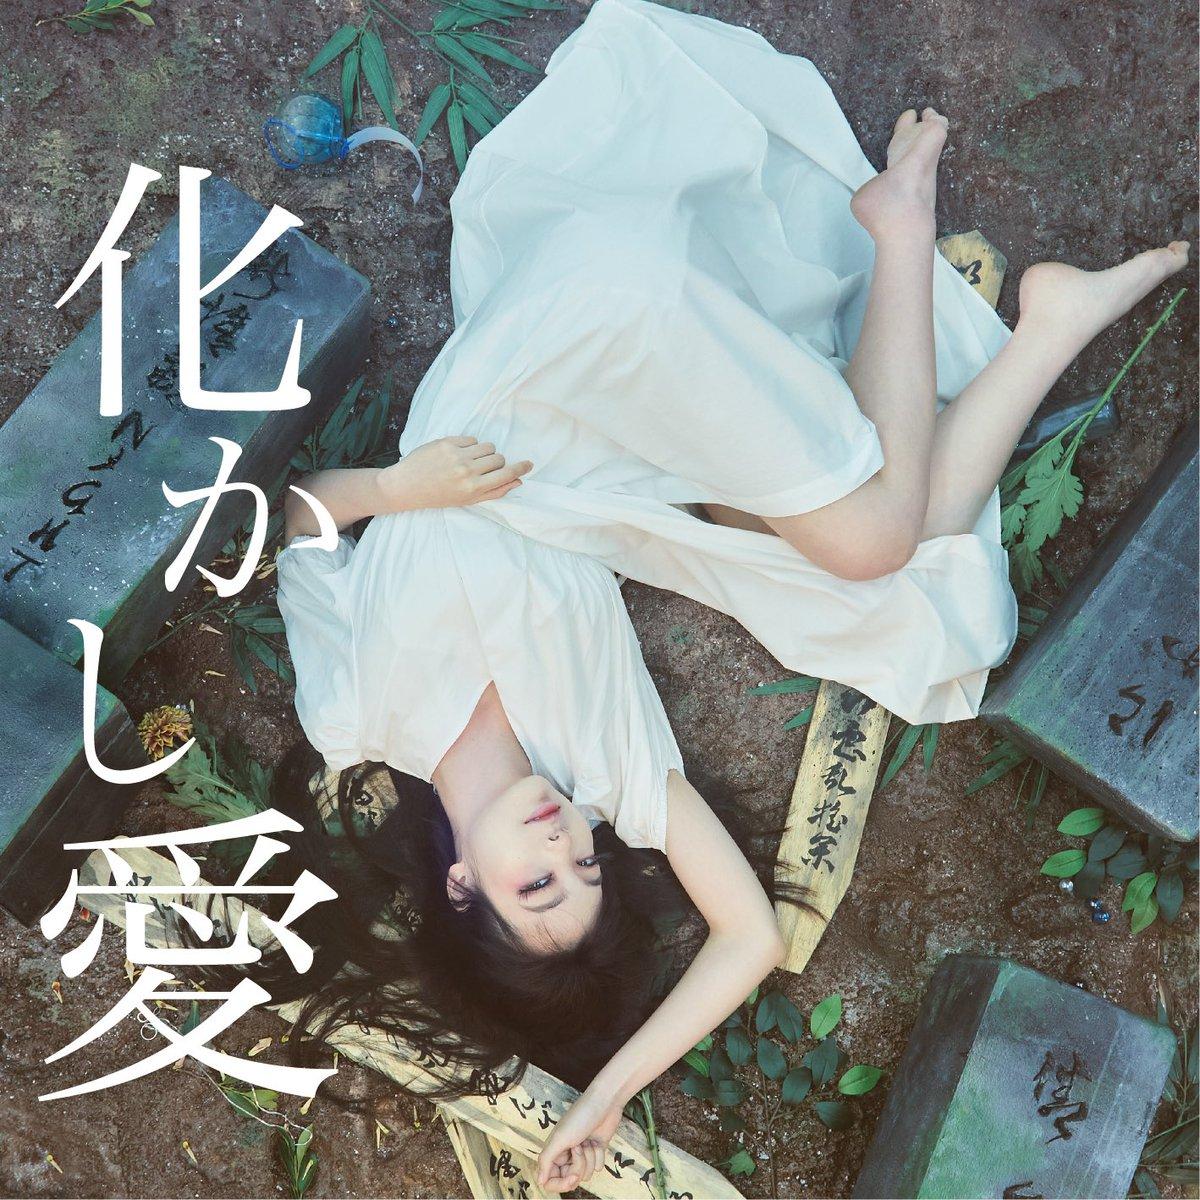 『MOSHIMO - 侘び寂び 夜遊び 夏祭り』収録の『化かし愛』ジャケット